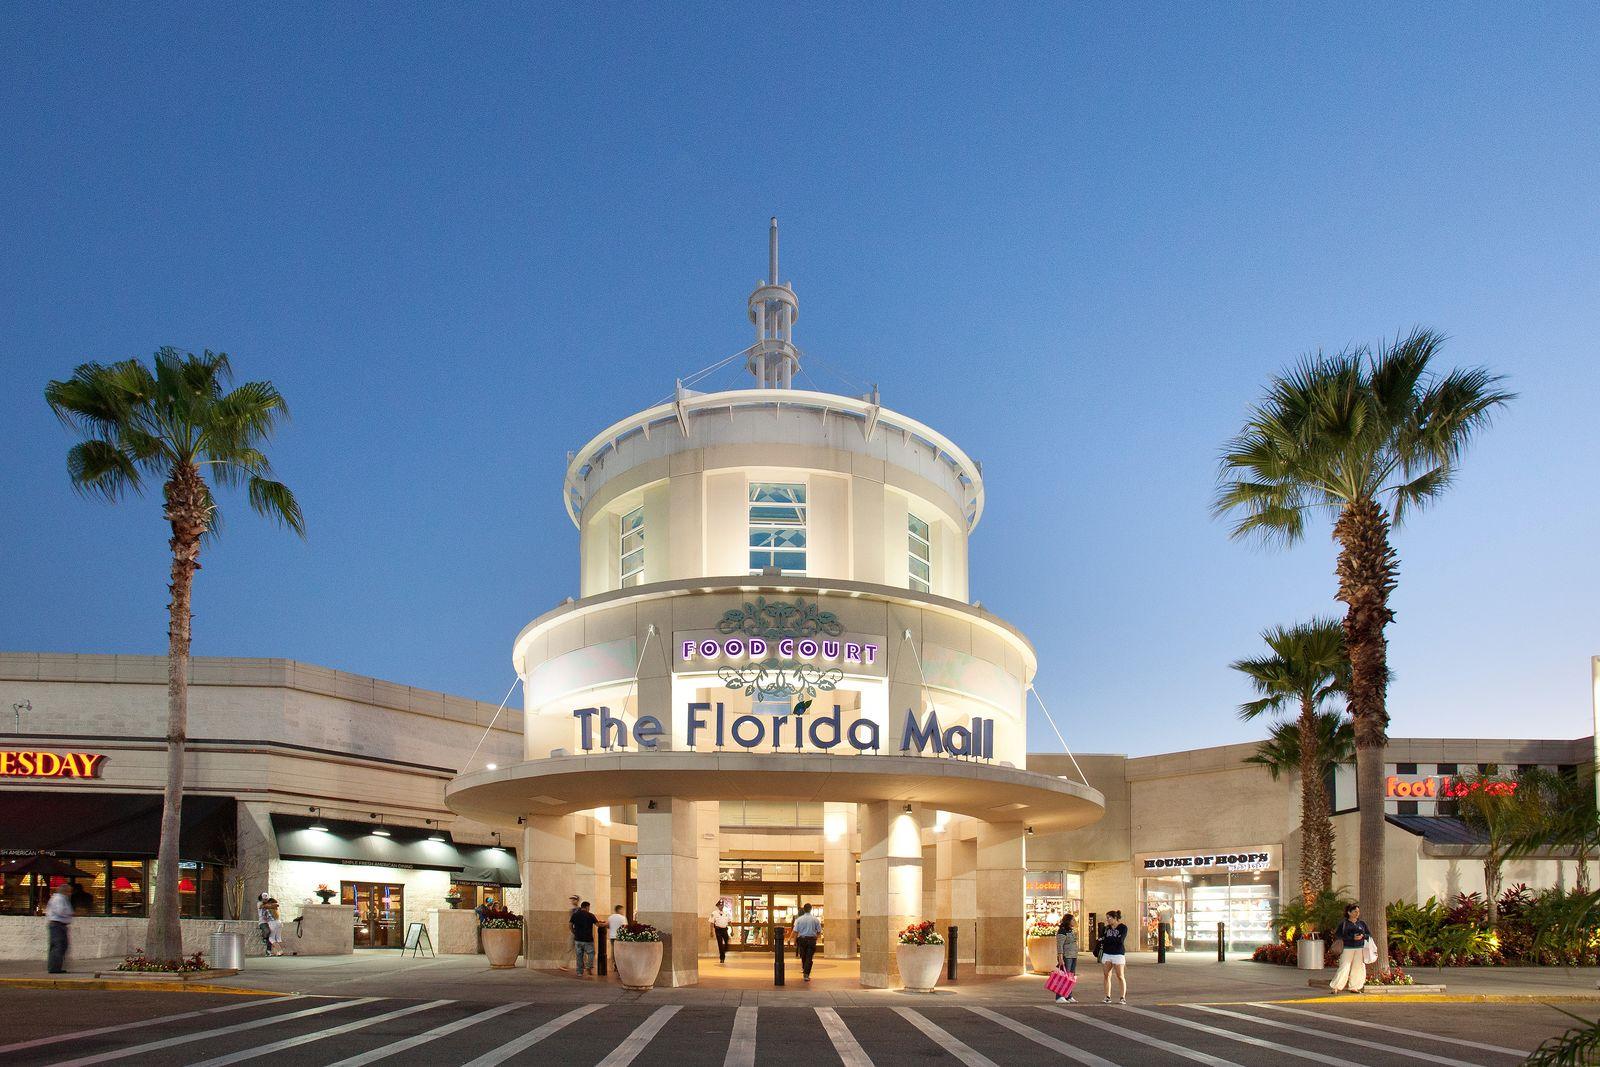 Impression The Florida Mall